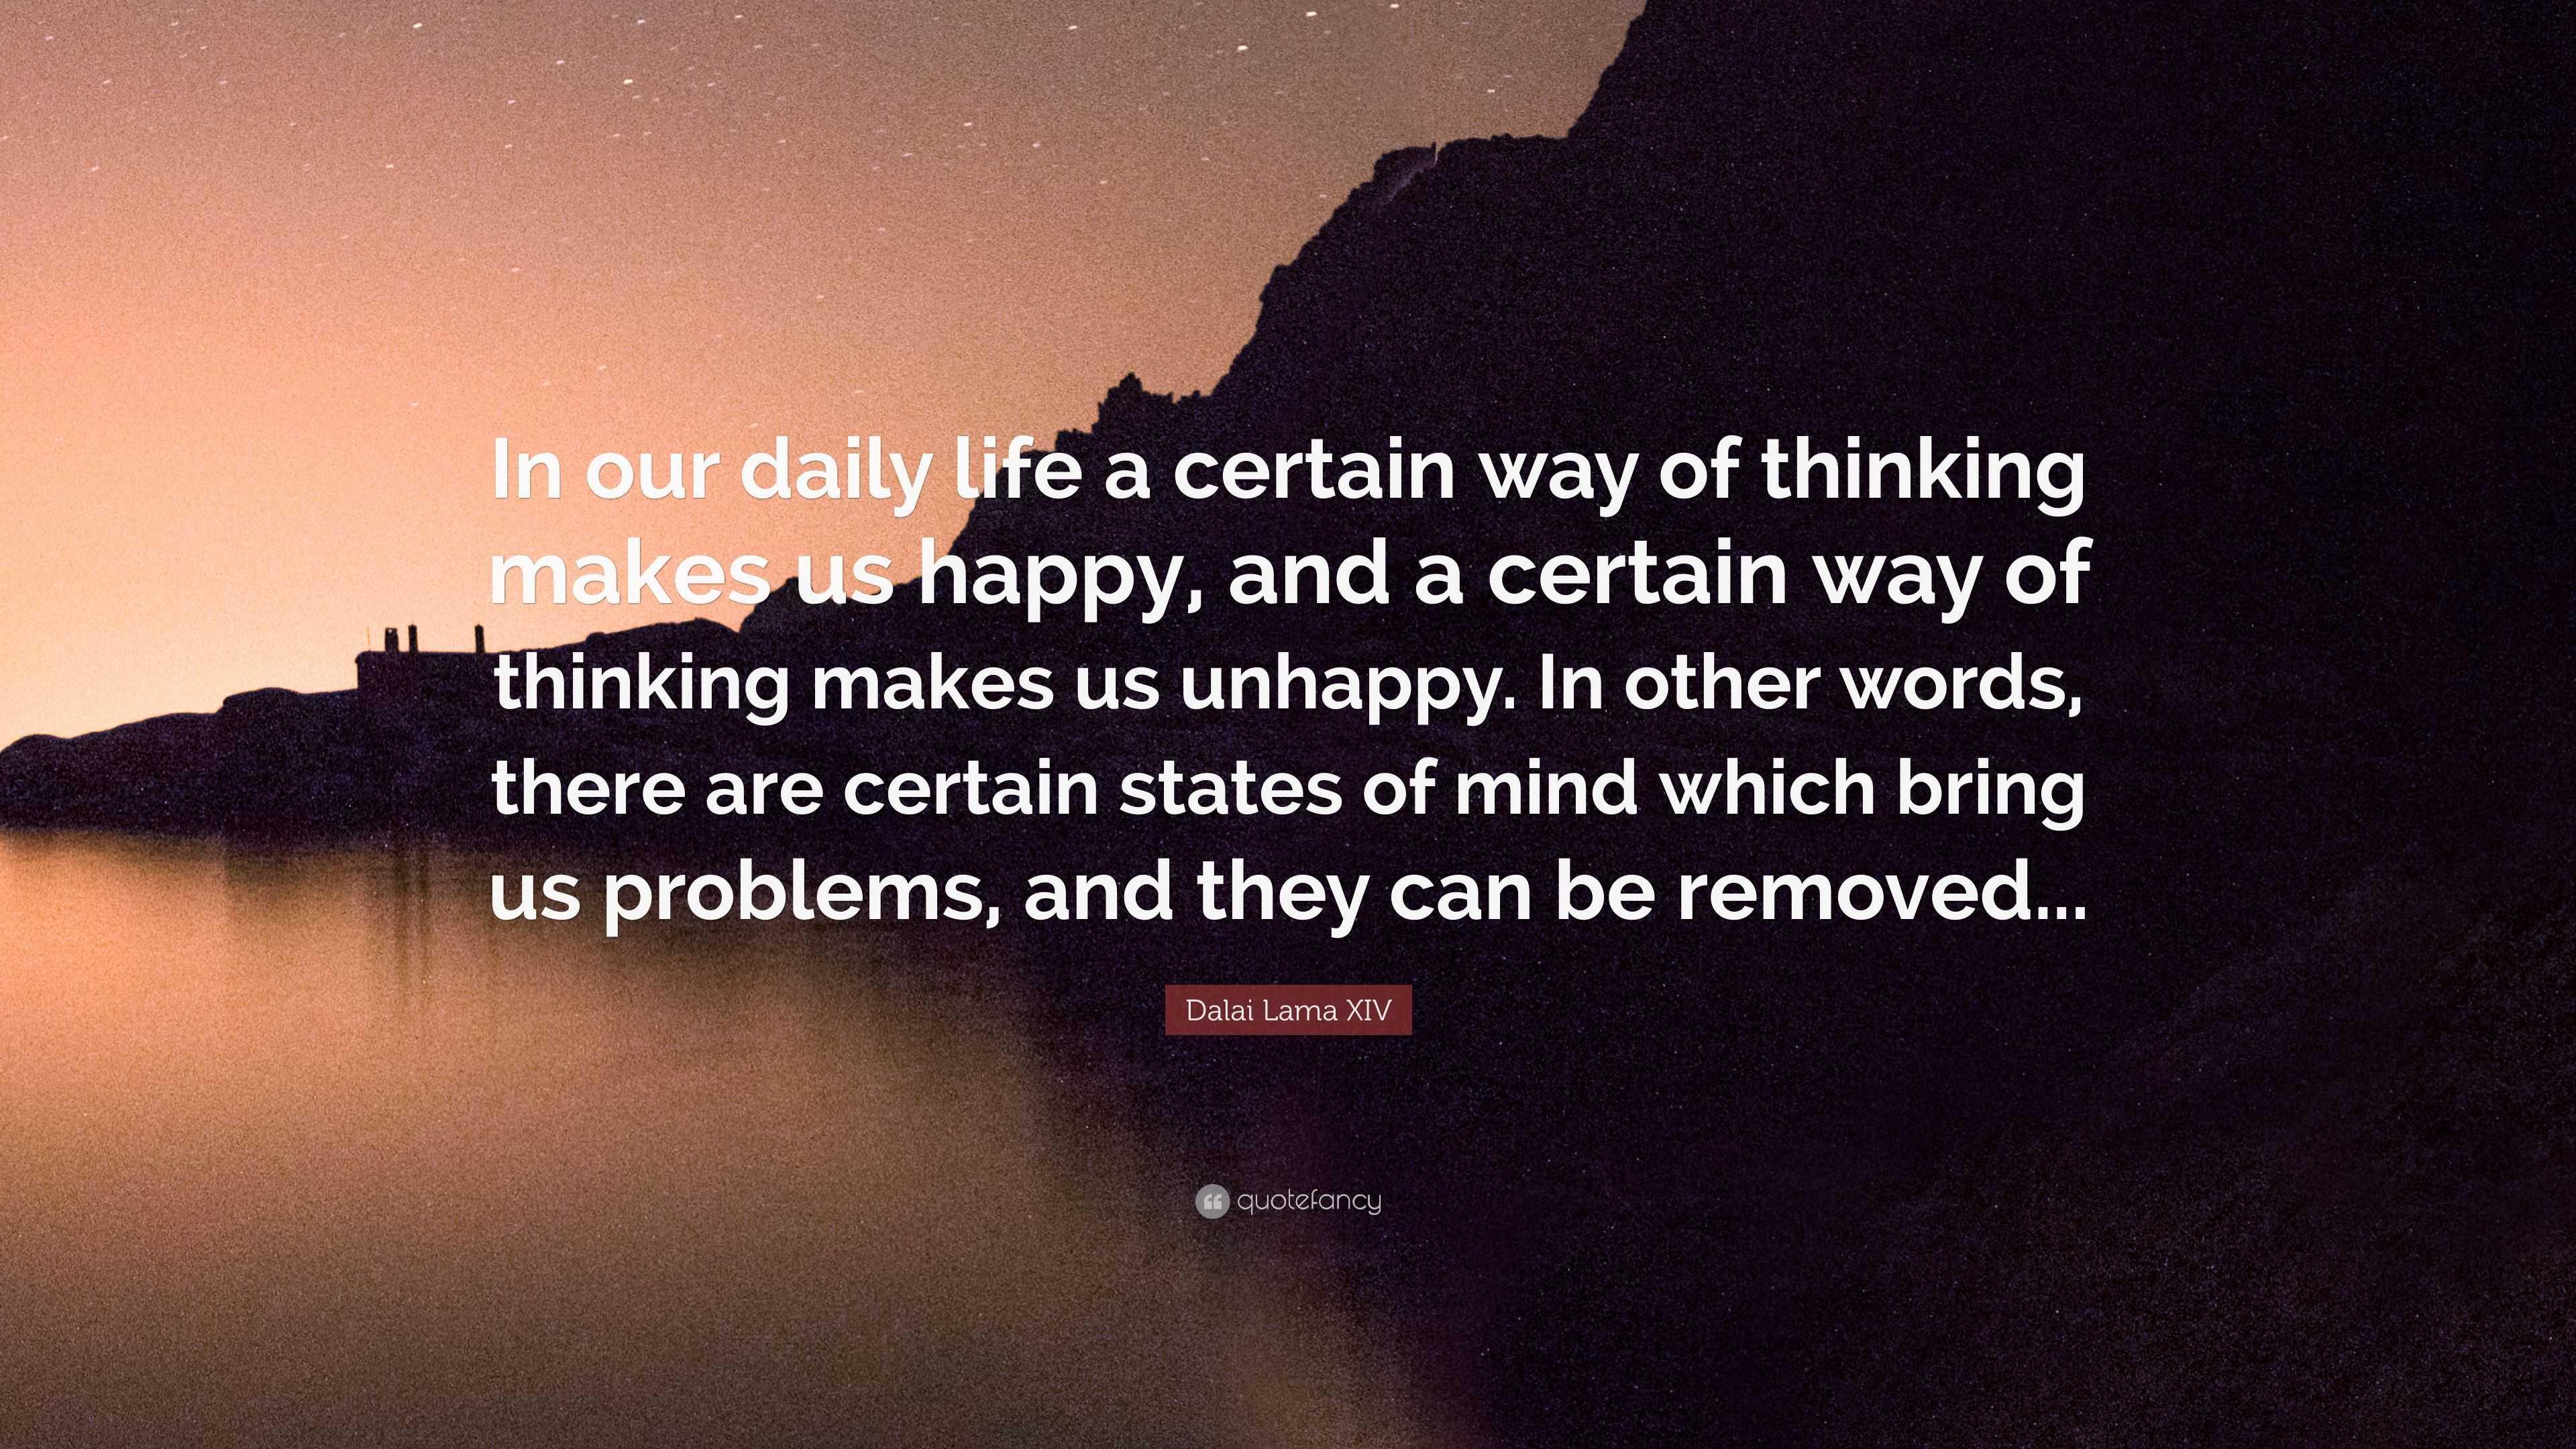 Dalai lama critical thinking quote